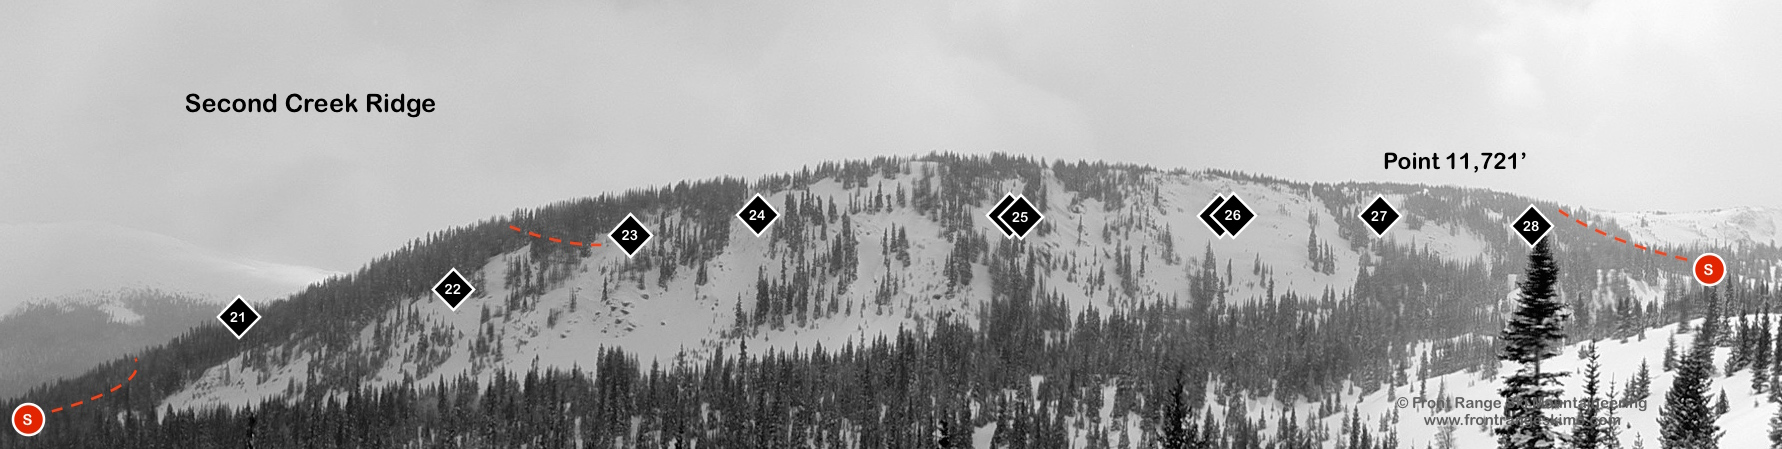 Second Creek Ridge as seen from First Creek Ridge.